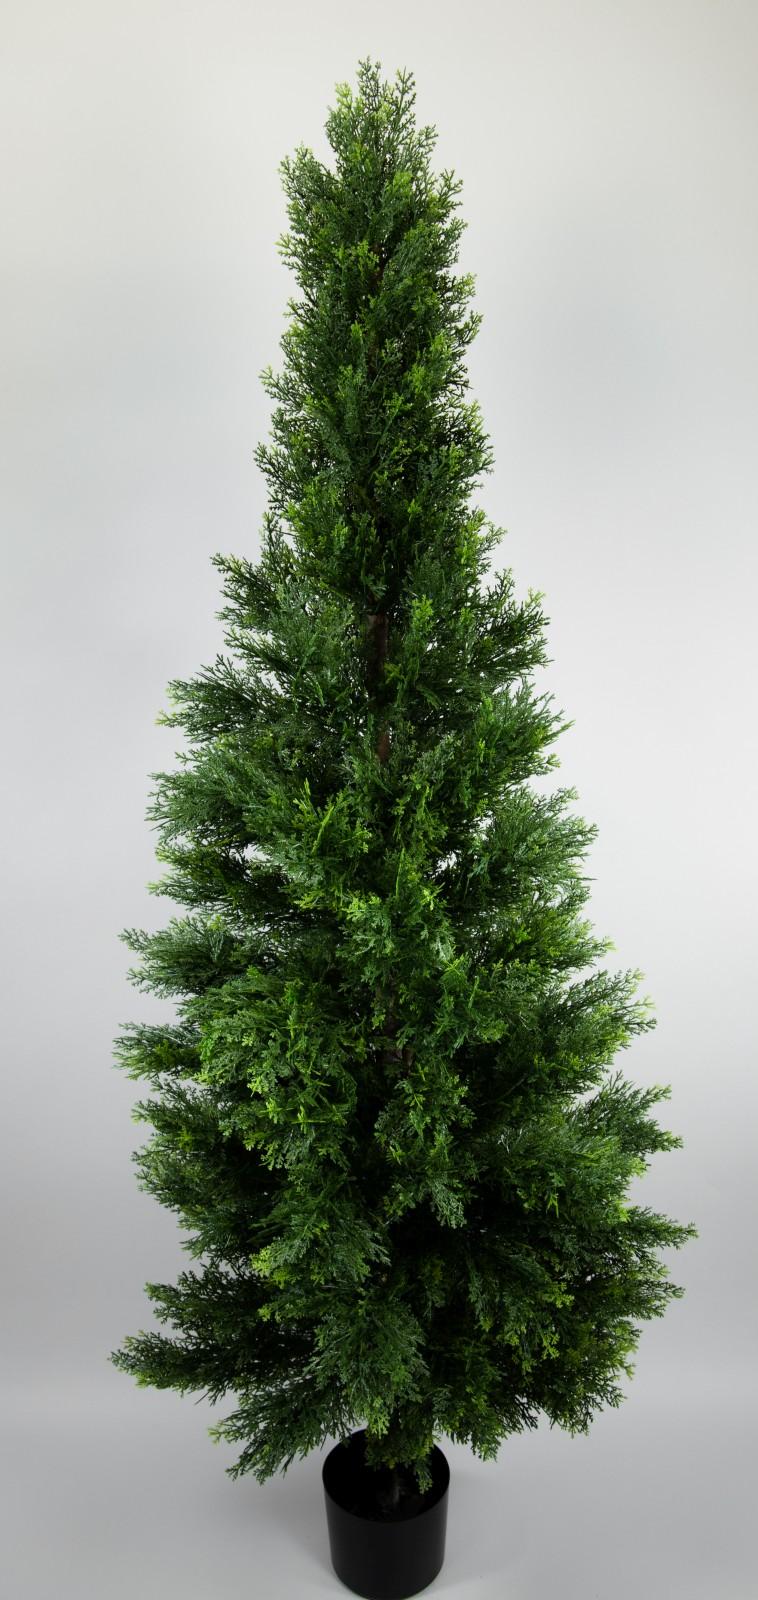 zeder konifere natura 180cm gr n la kunstpflanzen k nstliche pflanzen thuja ebay. Black Bedroom Furniture Sets. Home Design Ideas